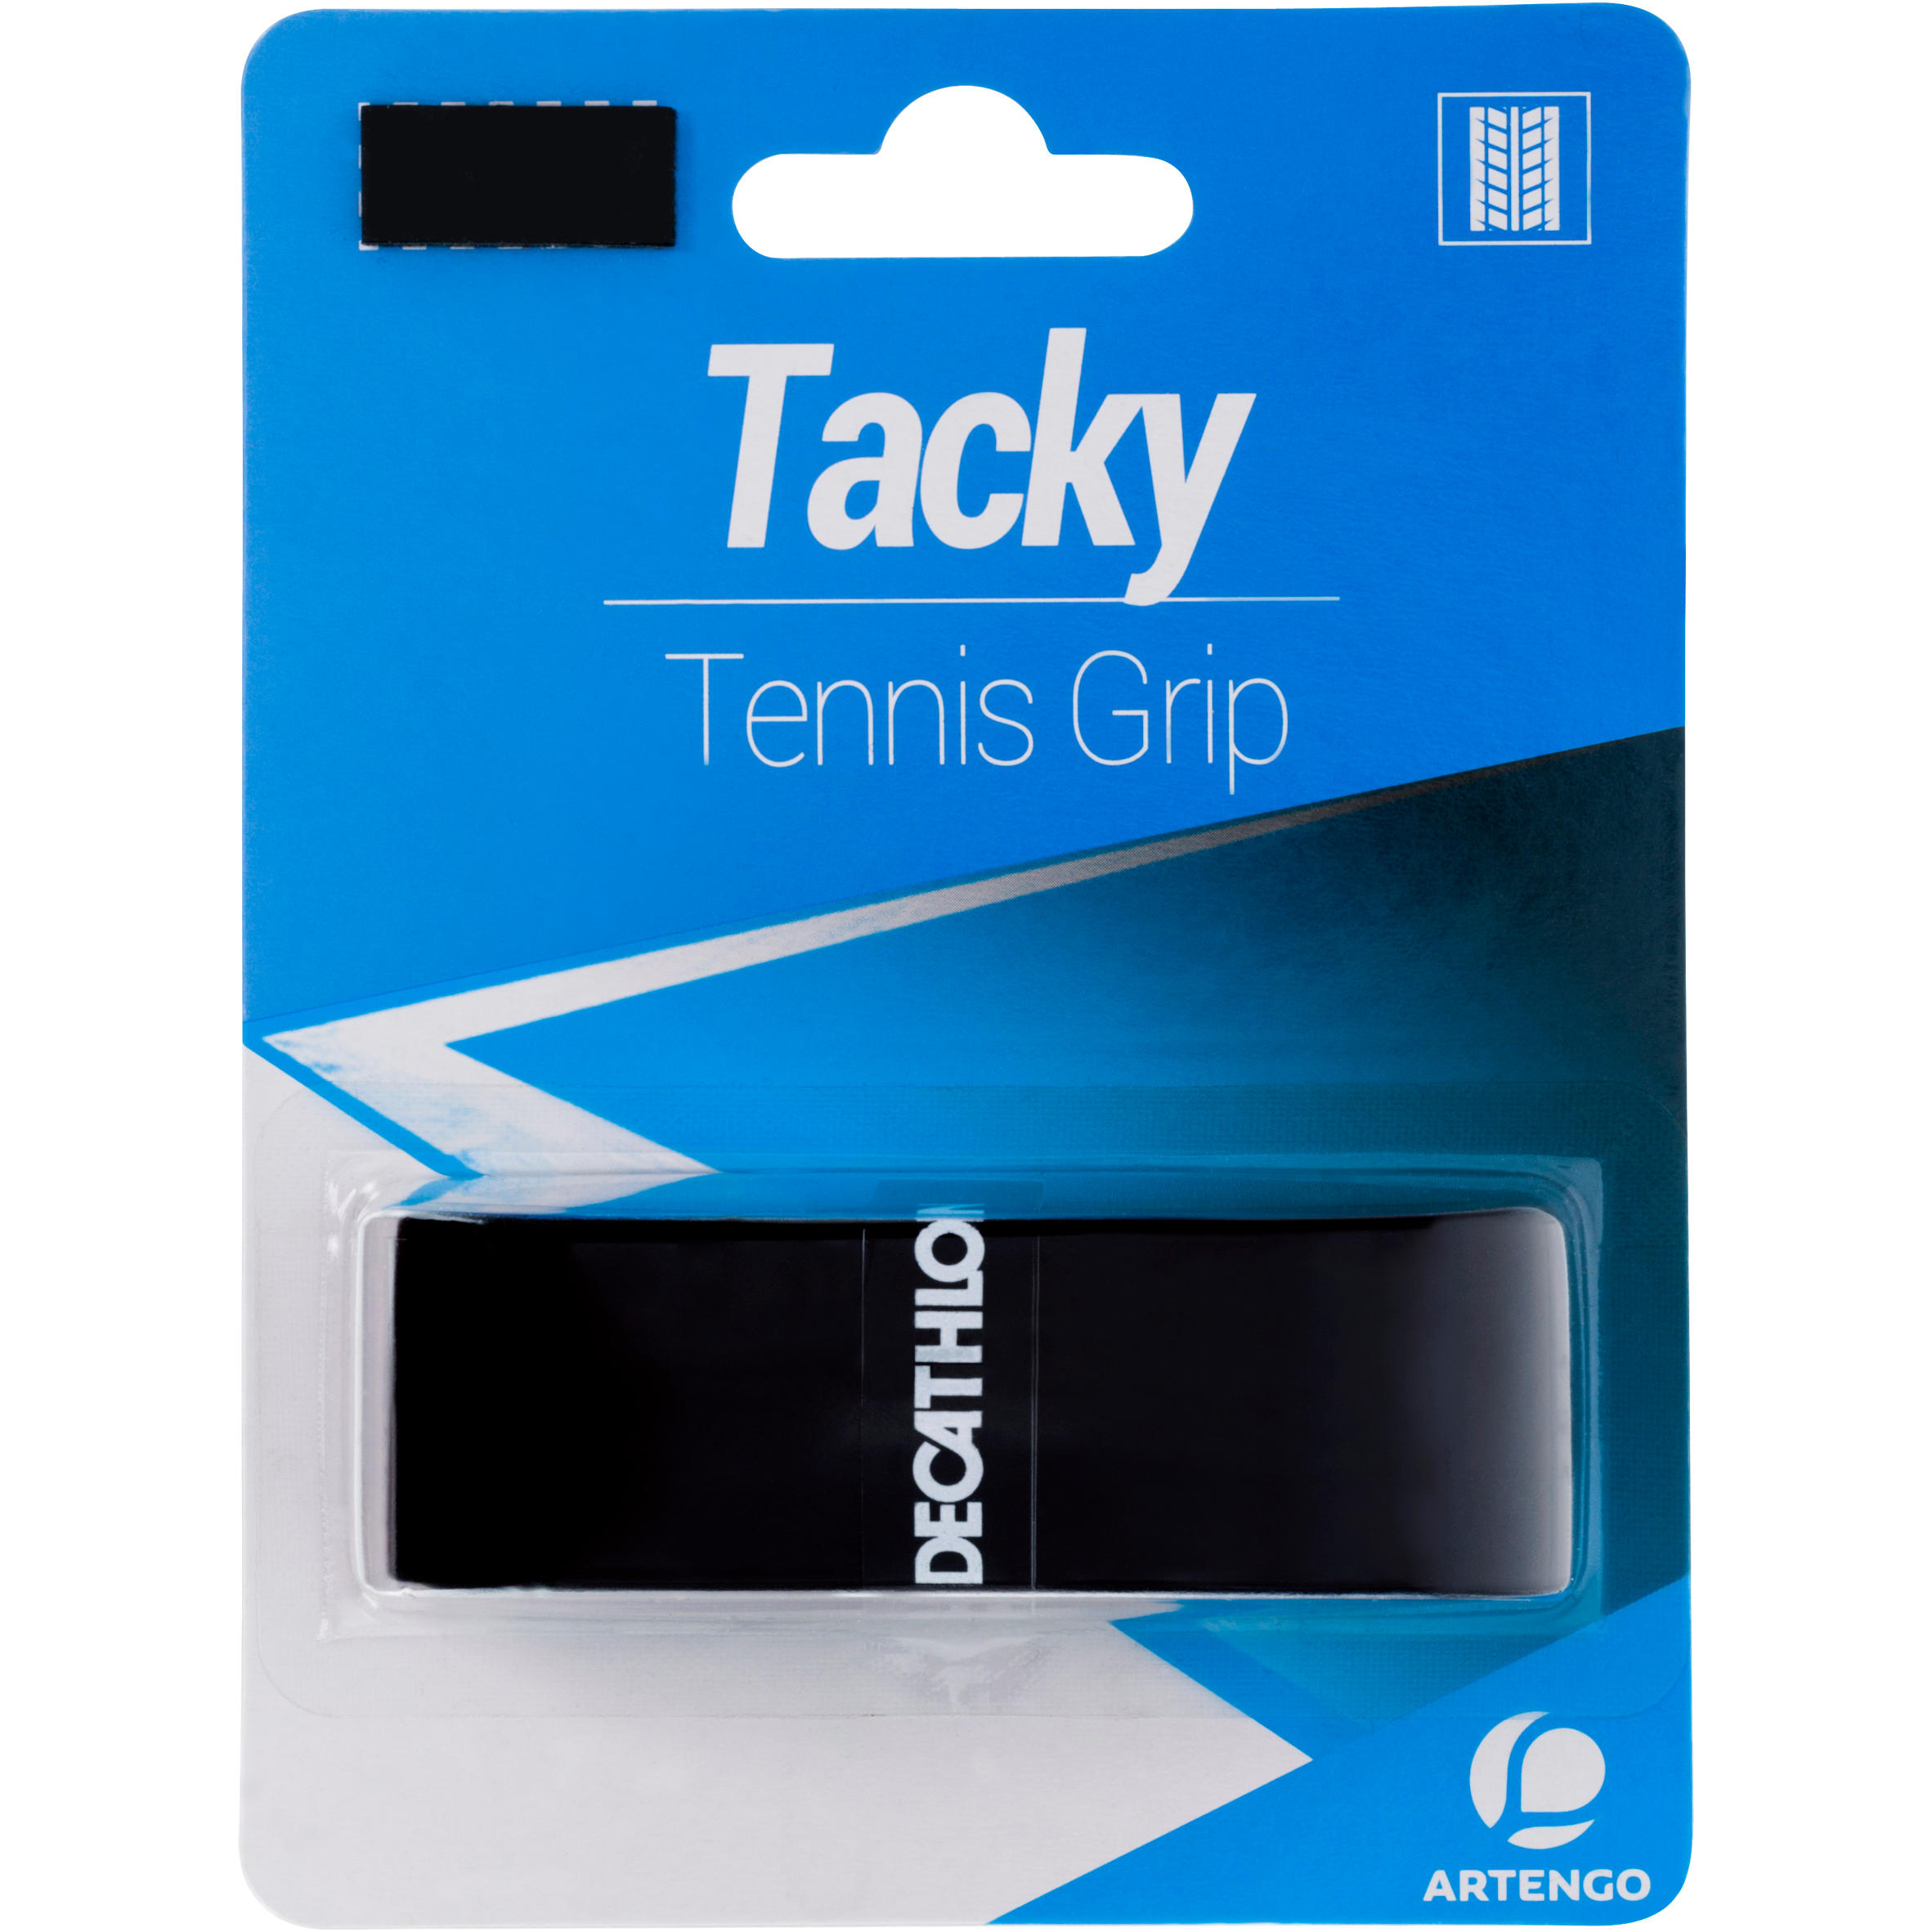 Artengo Tennisgrip Artengo Tacky zwart